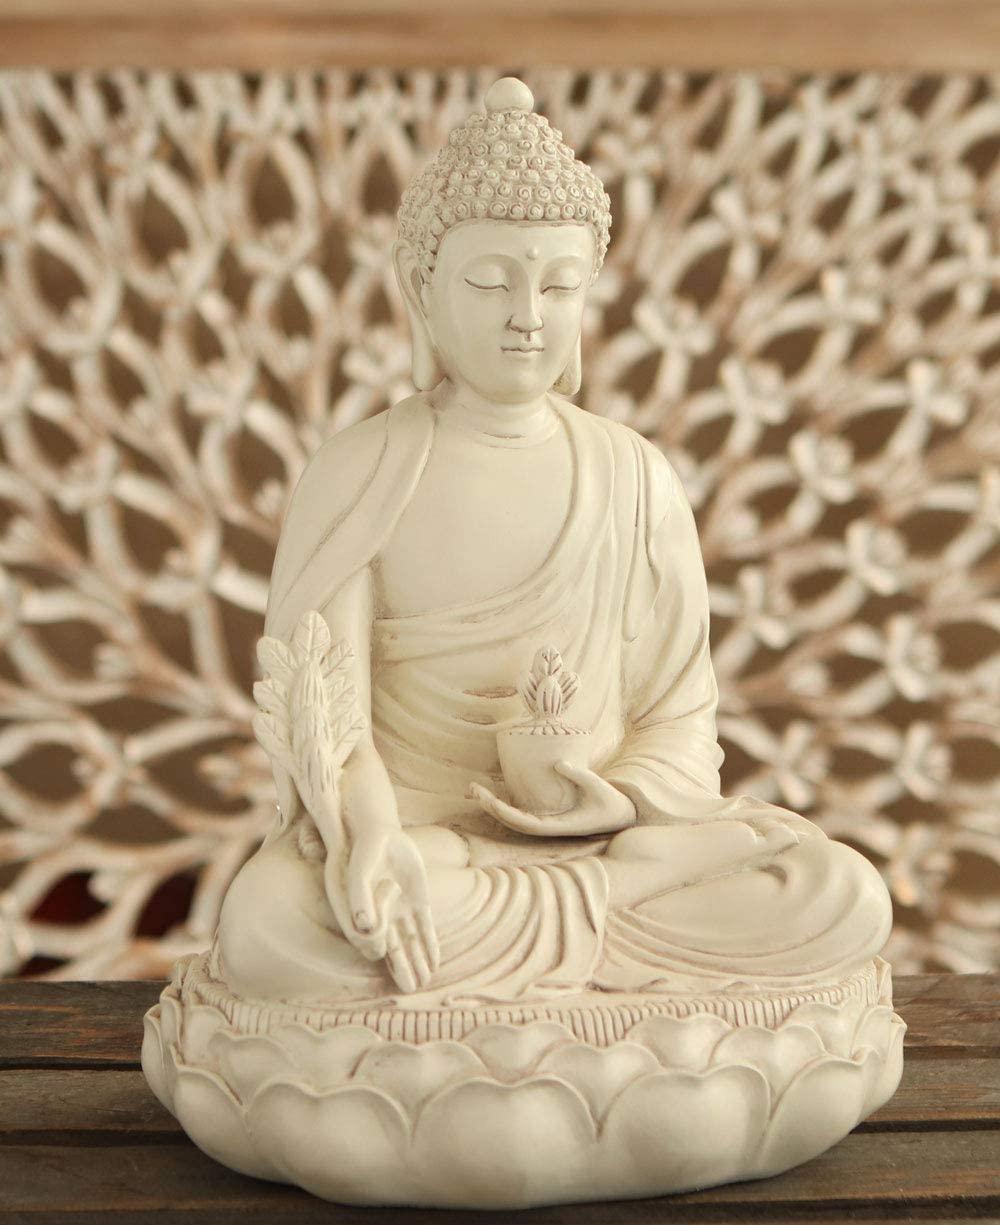 medicine-buddha-statue-white-finish-beautiful-bhaisayaguru-sculpture-spiritual-gift-cast-stone-healing-decor